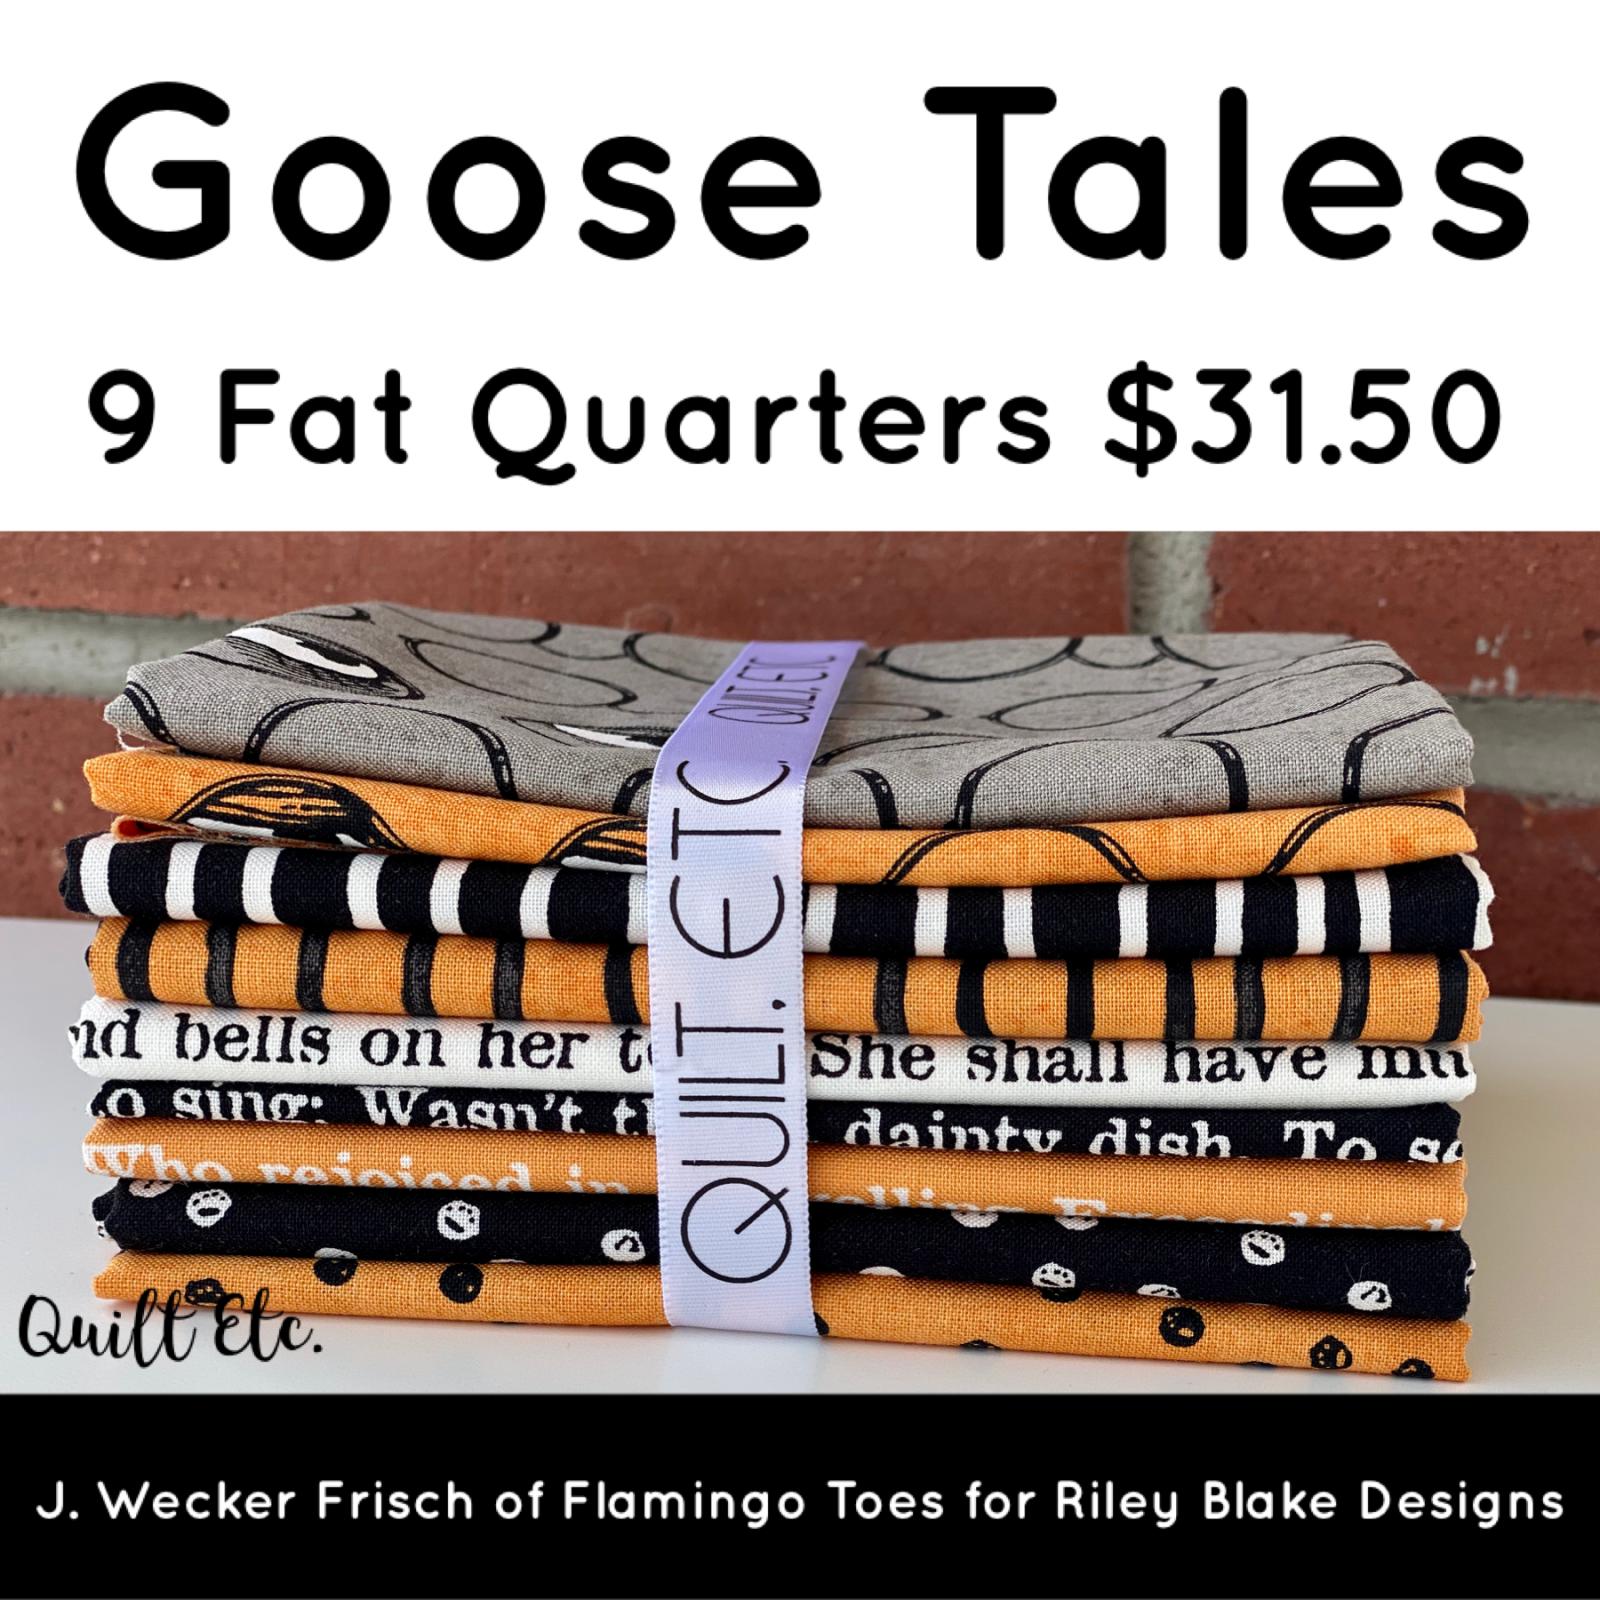 Goose Tales